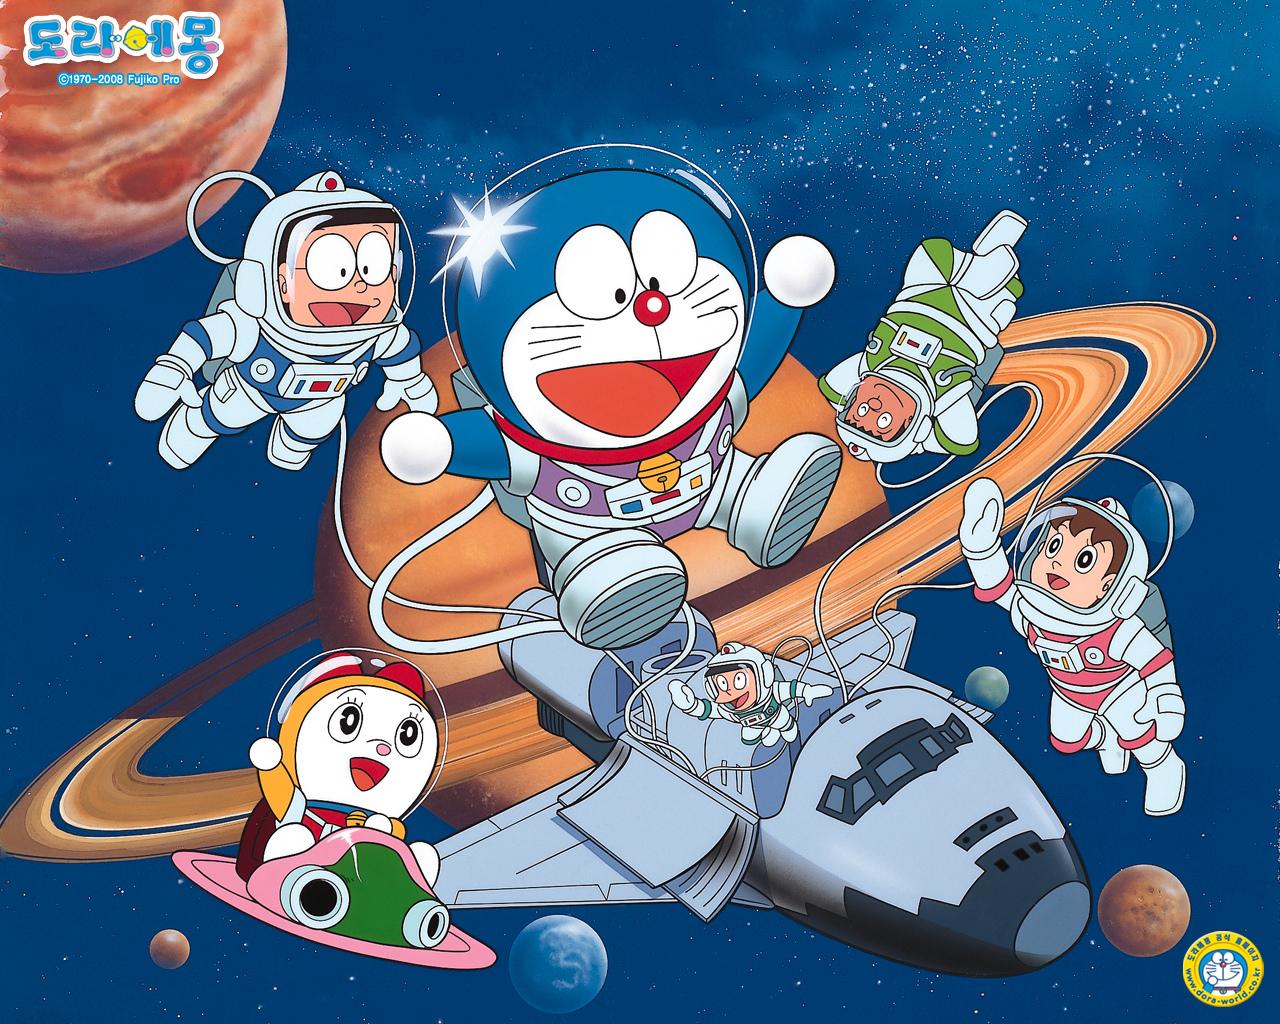 Fondos De Pantalla Grandes Gratis En Hd Gratis Para: Fondos De Pantalla De Doraemon, Wallpapers HD Gratis